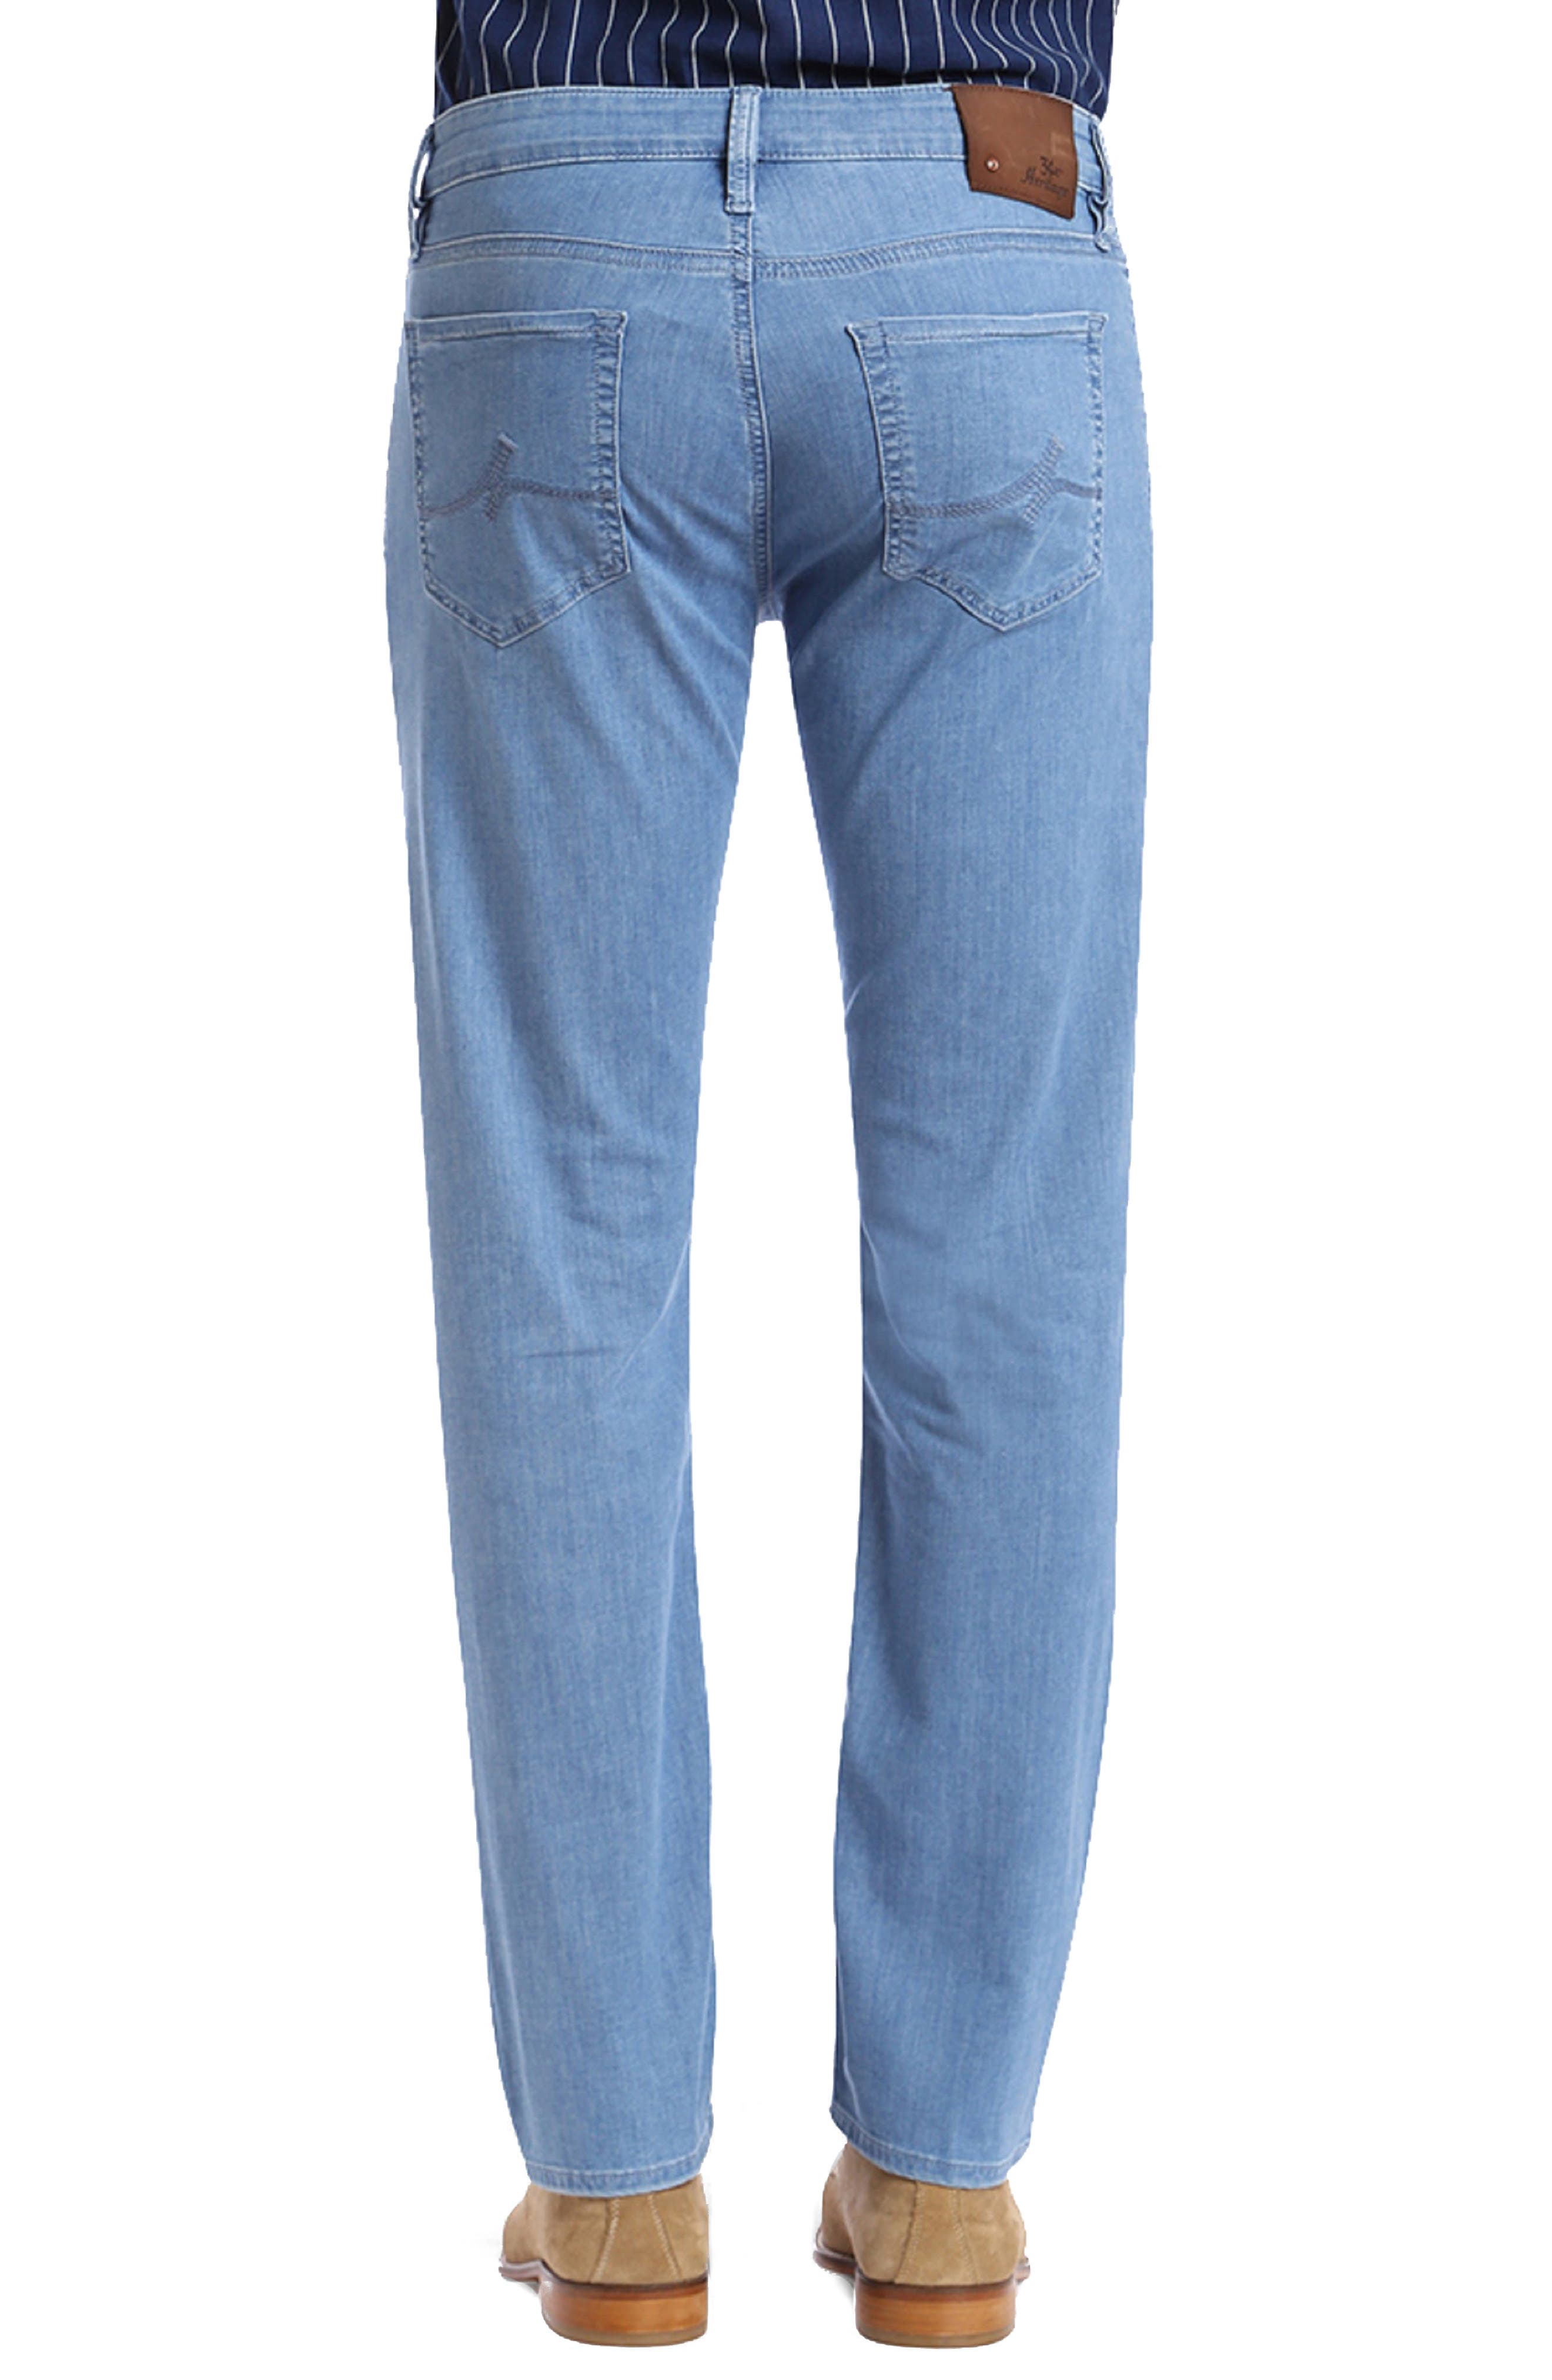 Charisma Relaxed Fit Jeans,                             Alternate thumbnail 2, color,                             Light Maui Denim